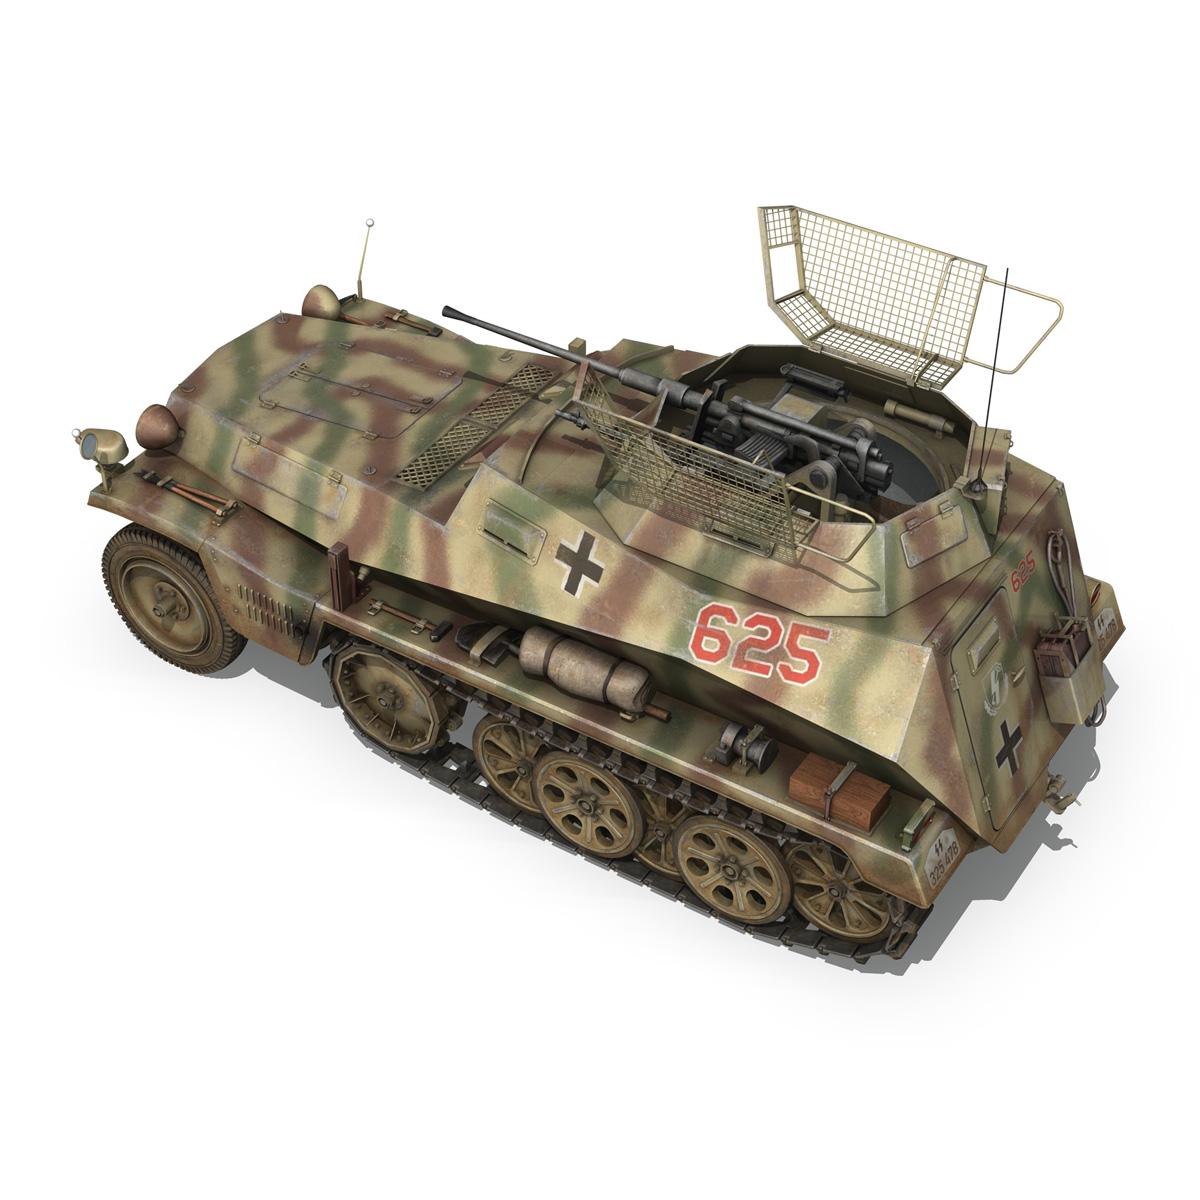 sd.kfz 250 9 – half-track armored vehicle 3d model 3ds fbx c4d lwo obj 198215